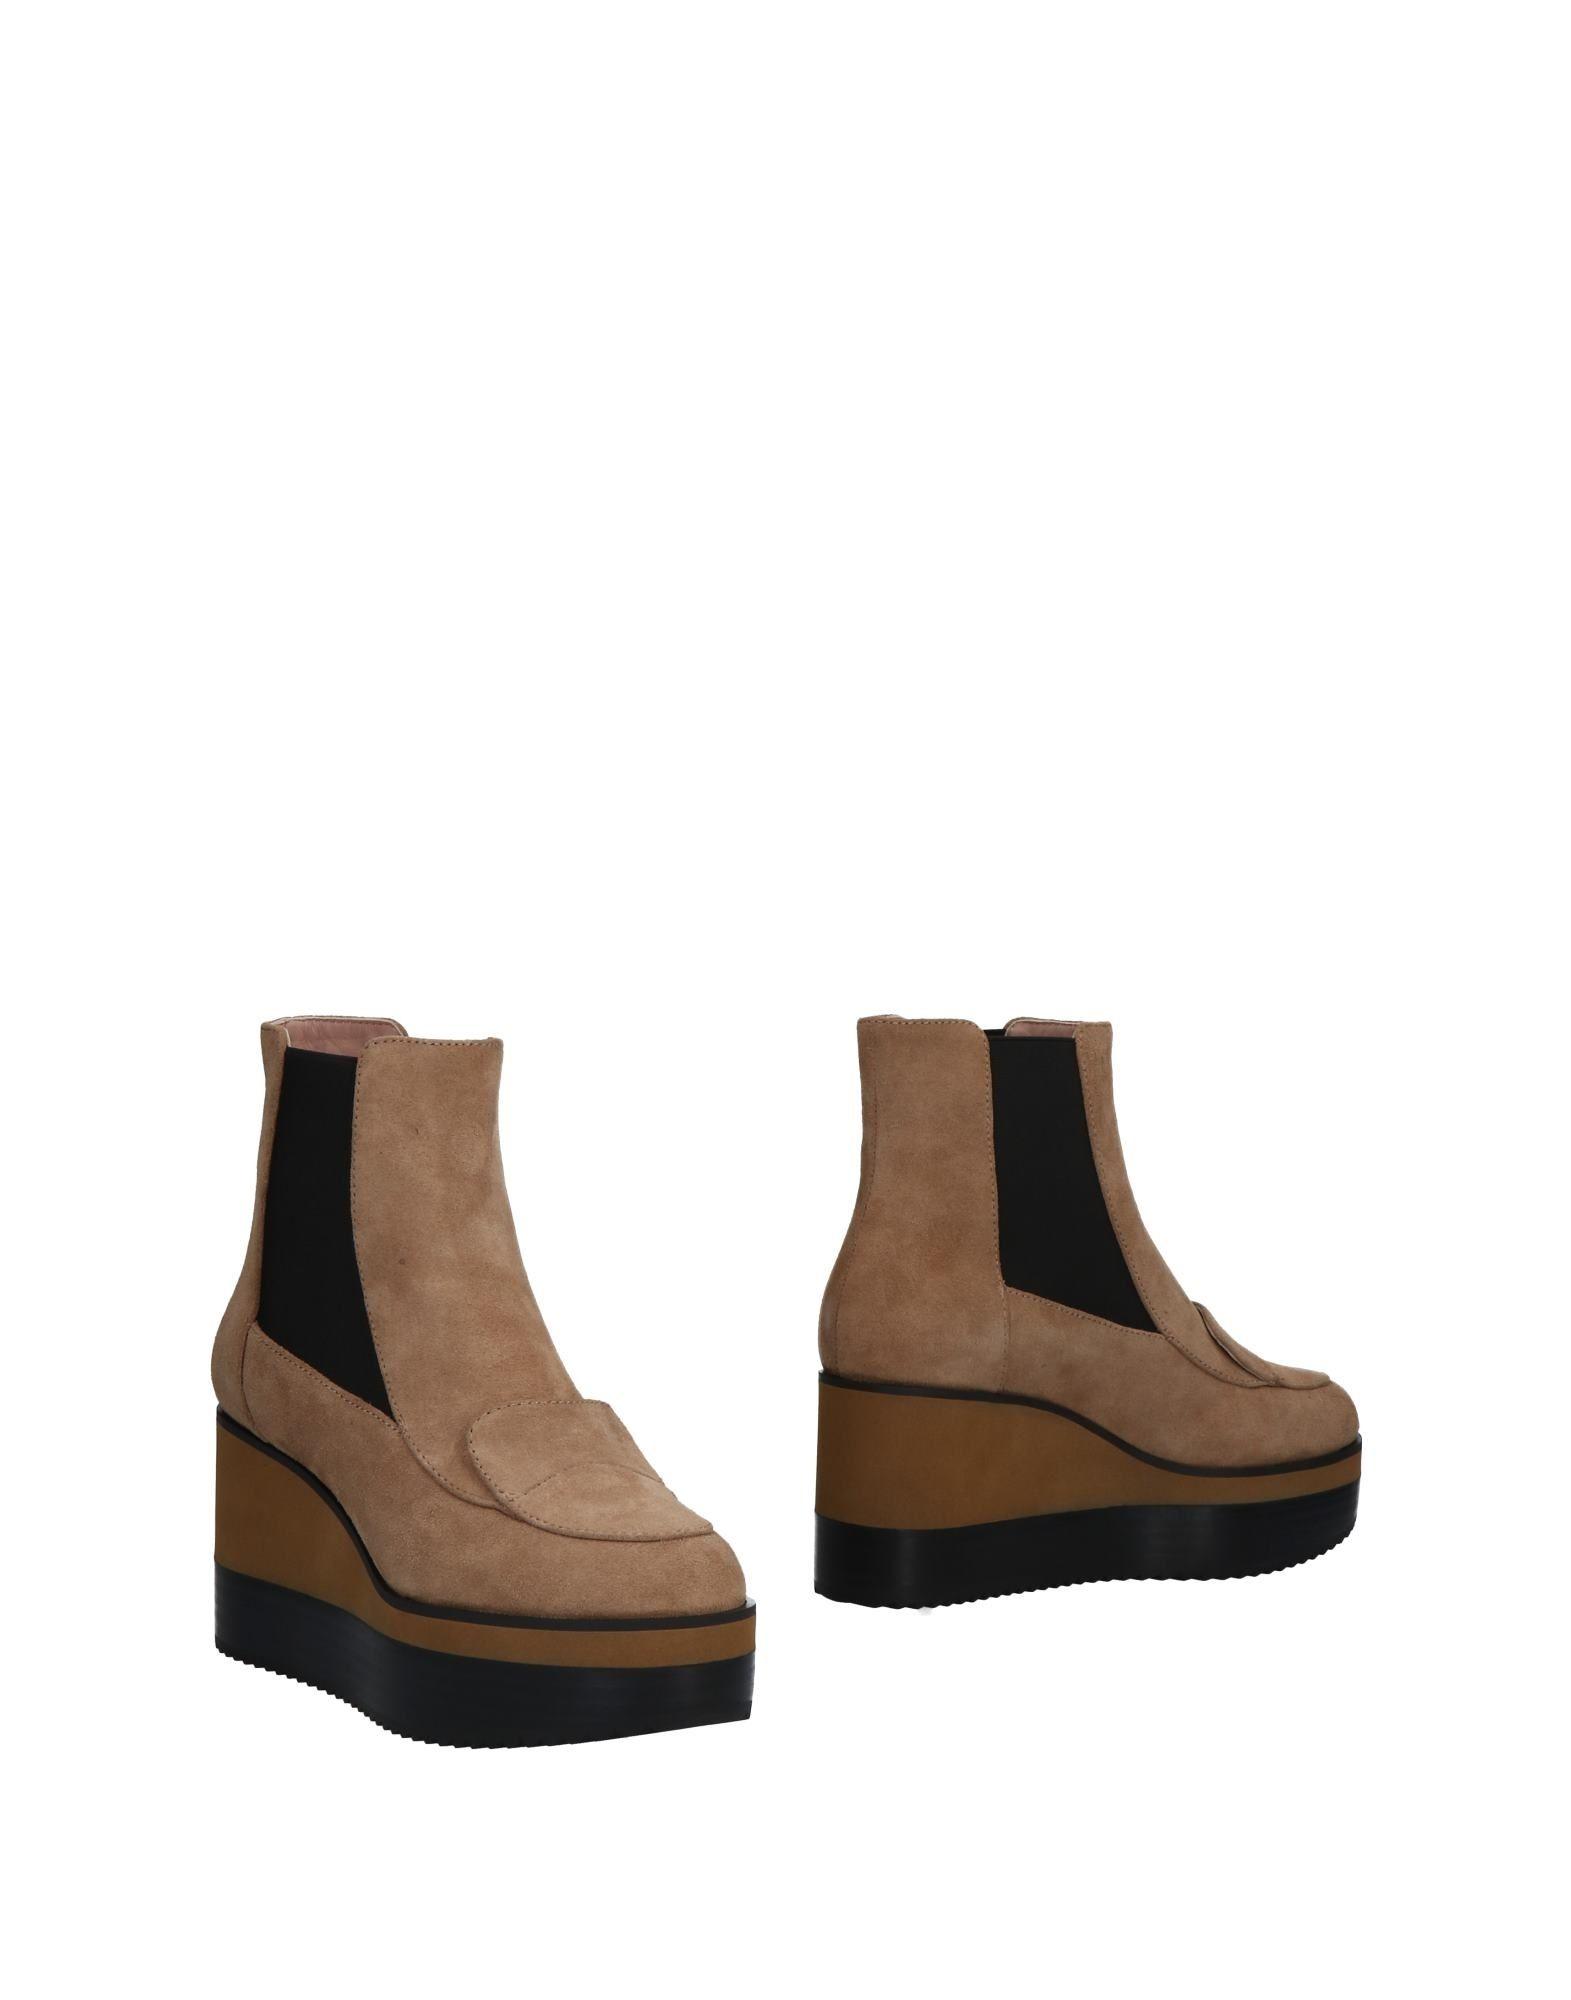 JIL SANDER NAVY Полусапоги и высокие ботинки